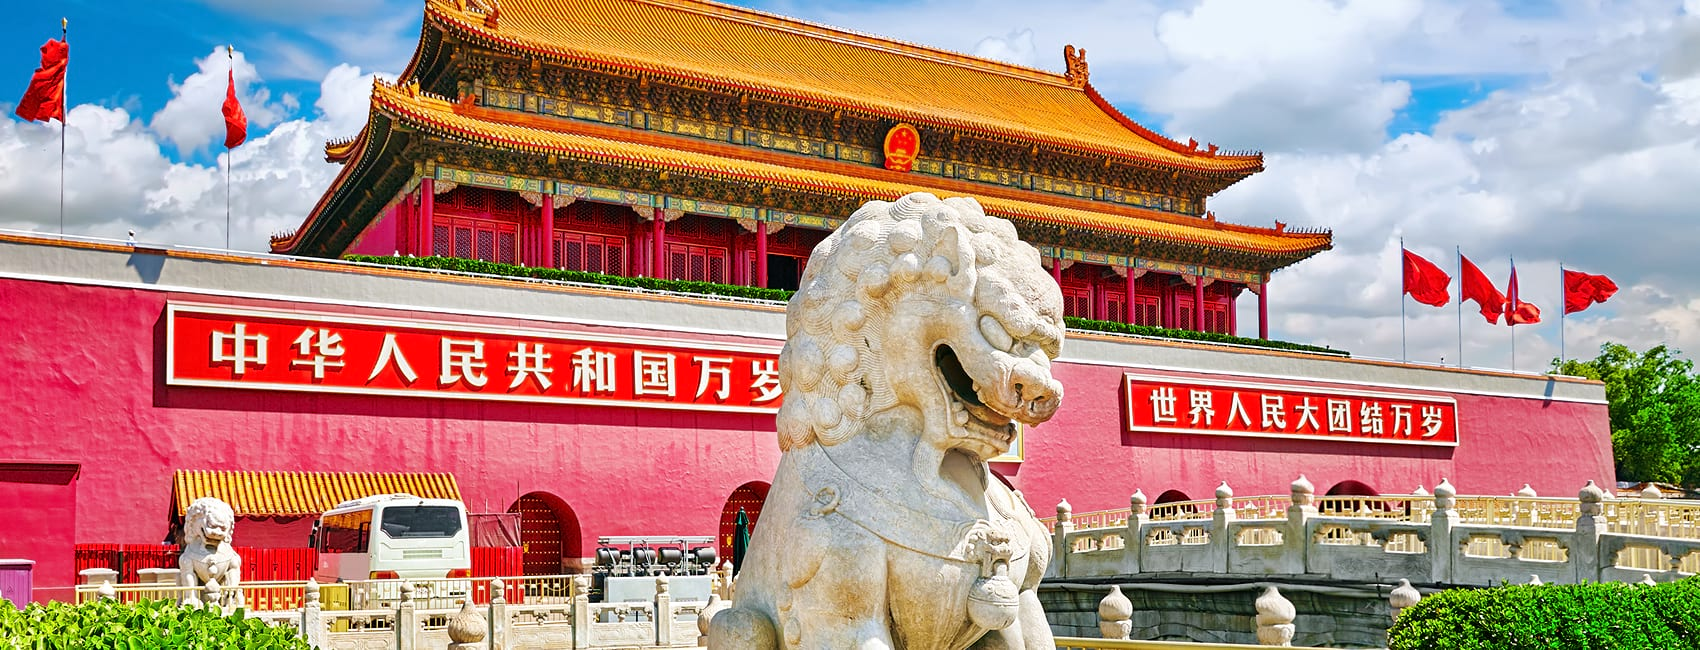 10 Days in China Beijing Shanghai Hangzhou